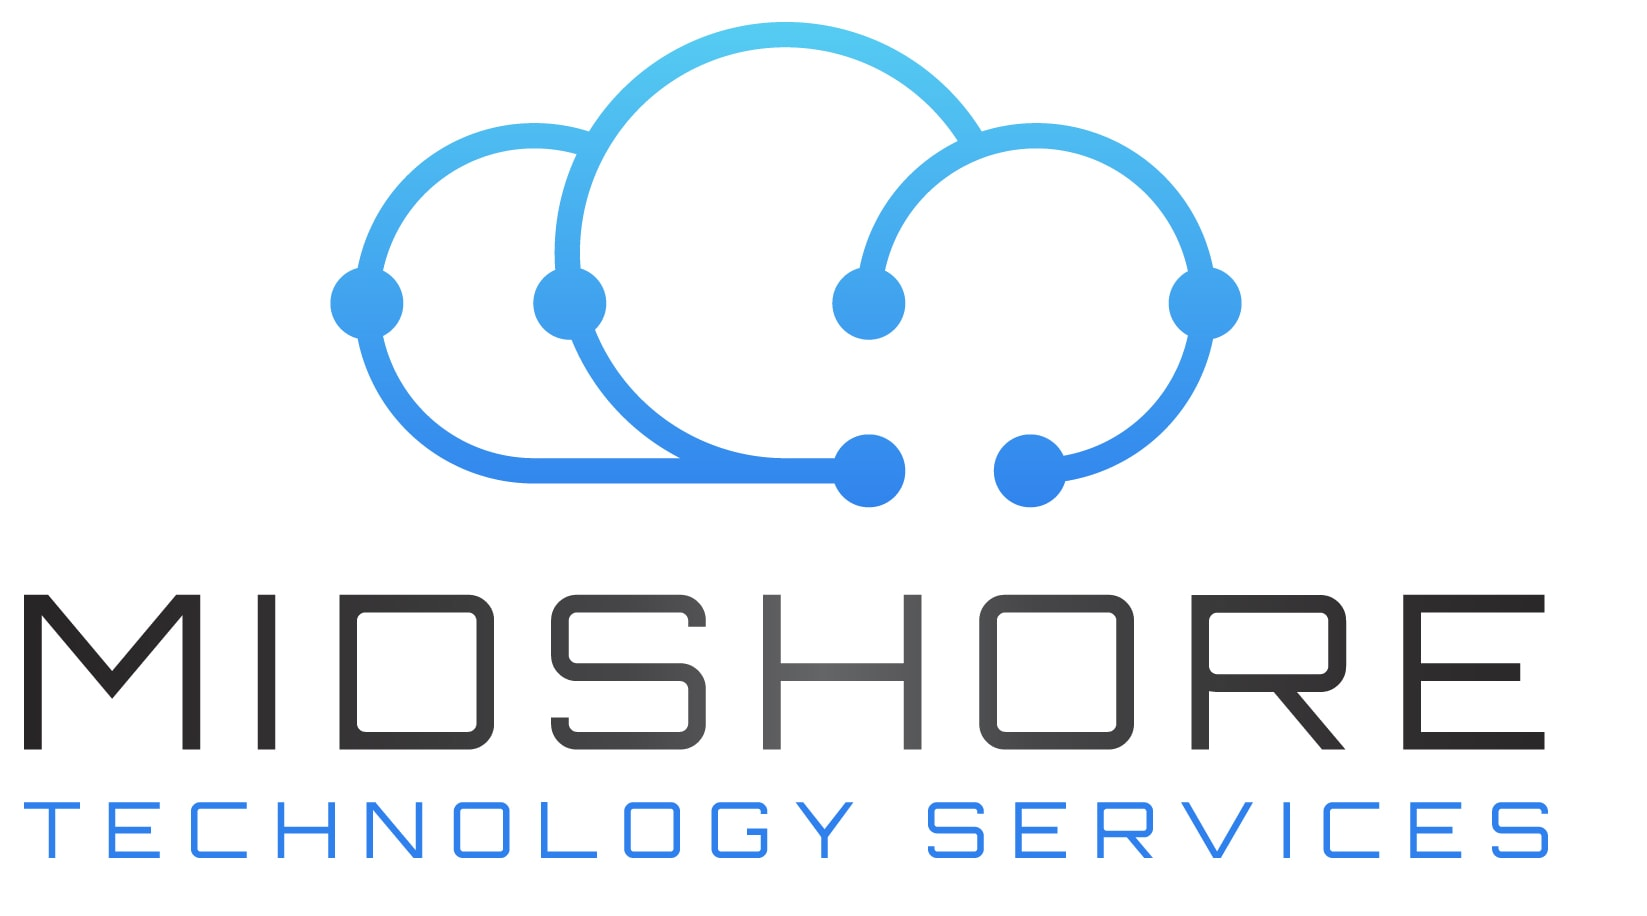 Midshore-Technology-Services-lolgo-A-(1)-w1647.jpg